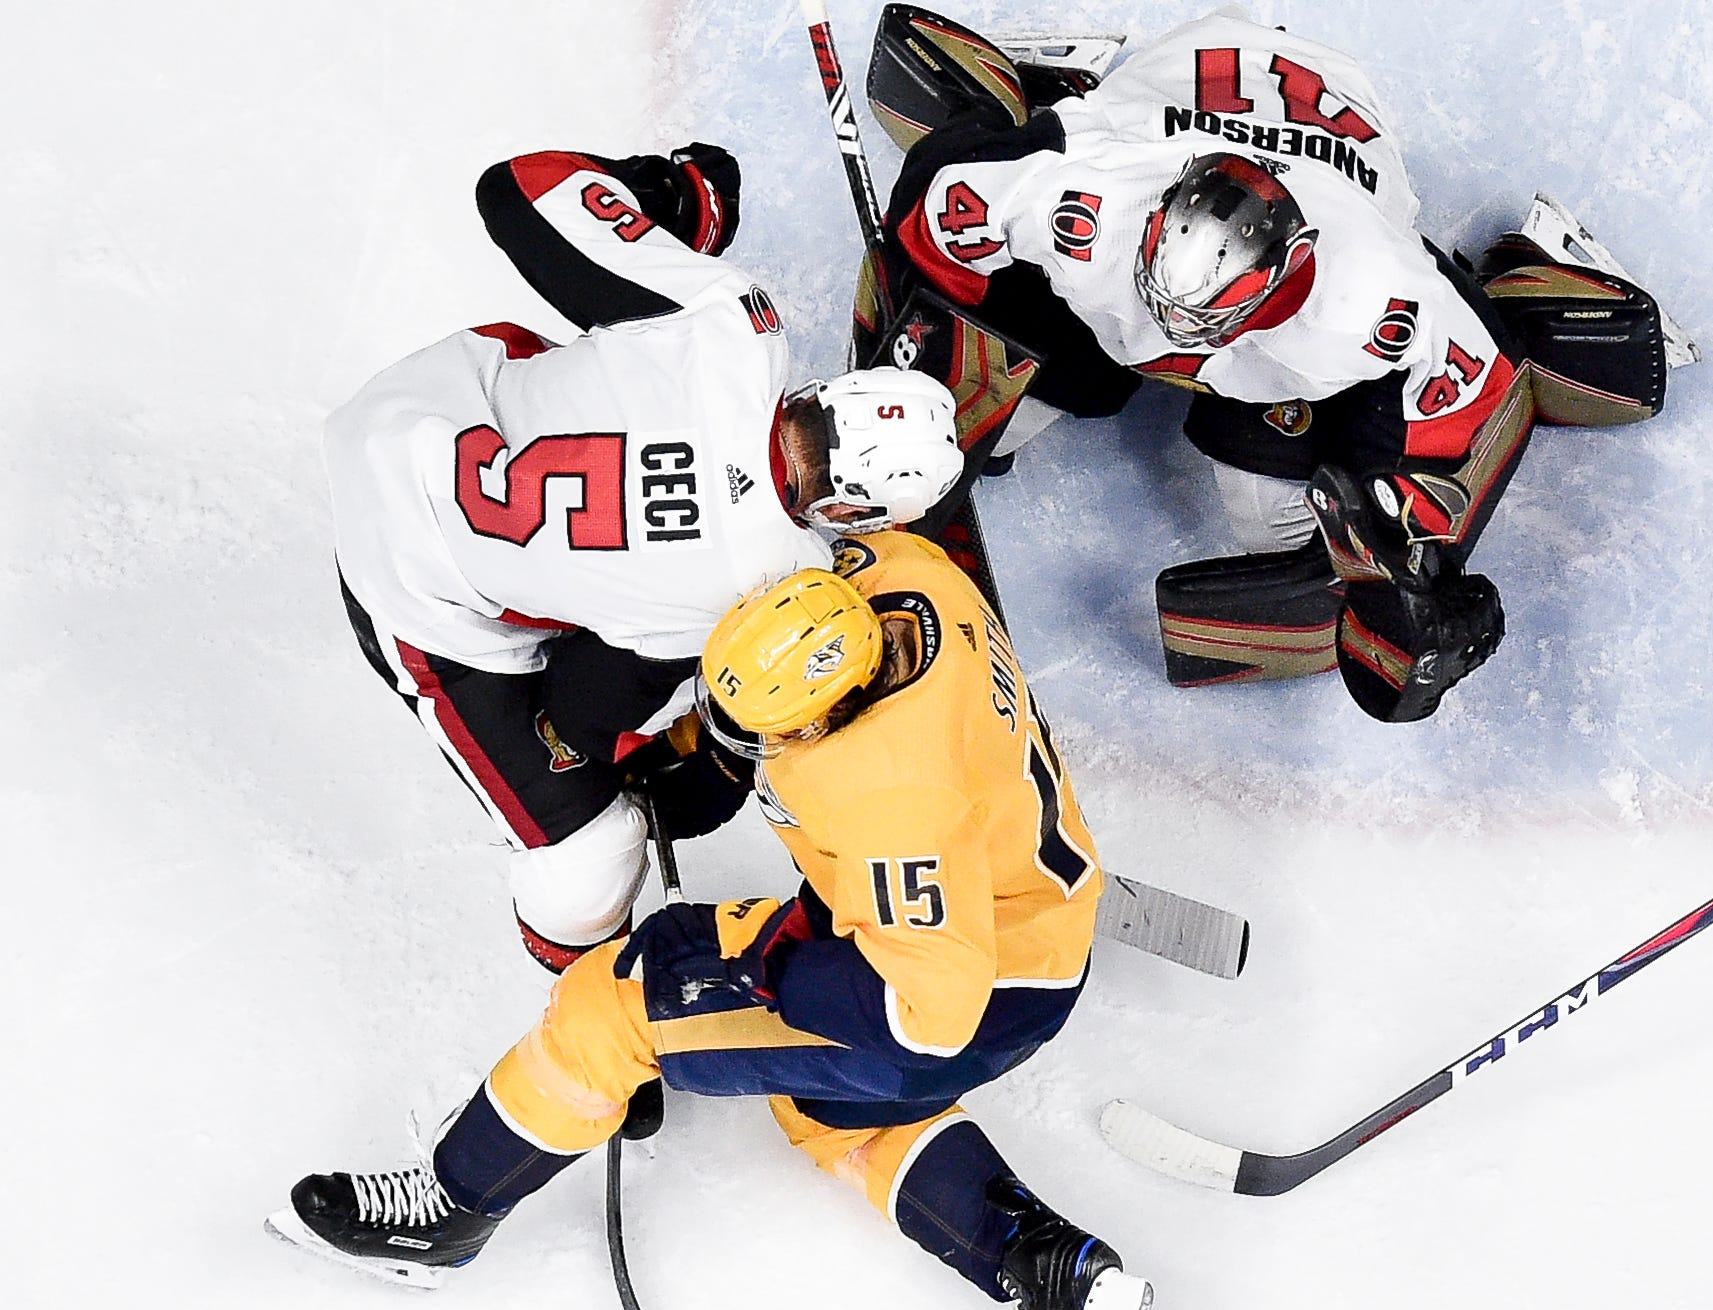 Nashville Predators right wing Craig Smith (15) flights for the puck with Ottawa Senators defenseman Cody Ceci (5) and goaltender Craig Anderson (41) during the second period at Bridgestone Arena in Nashville, Tenn., Tuesday, Dec. 11, 2018.